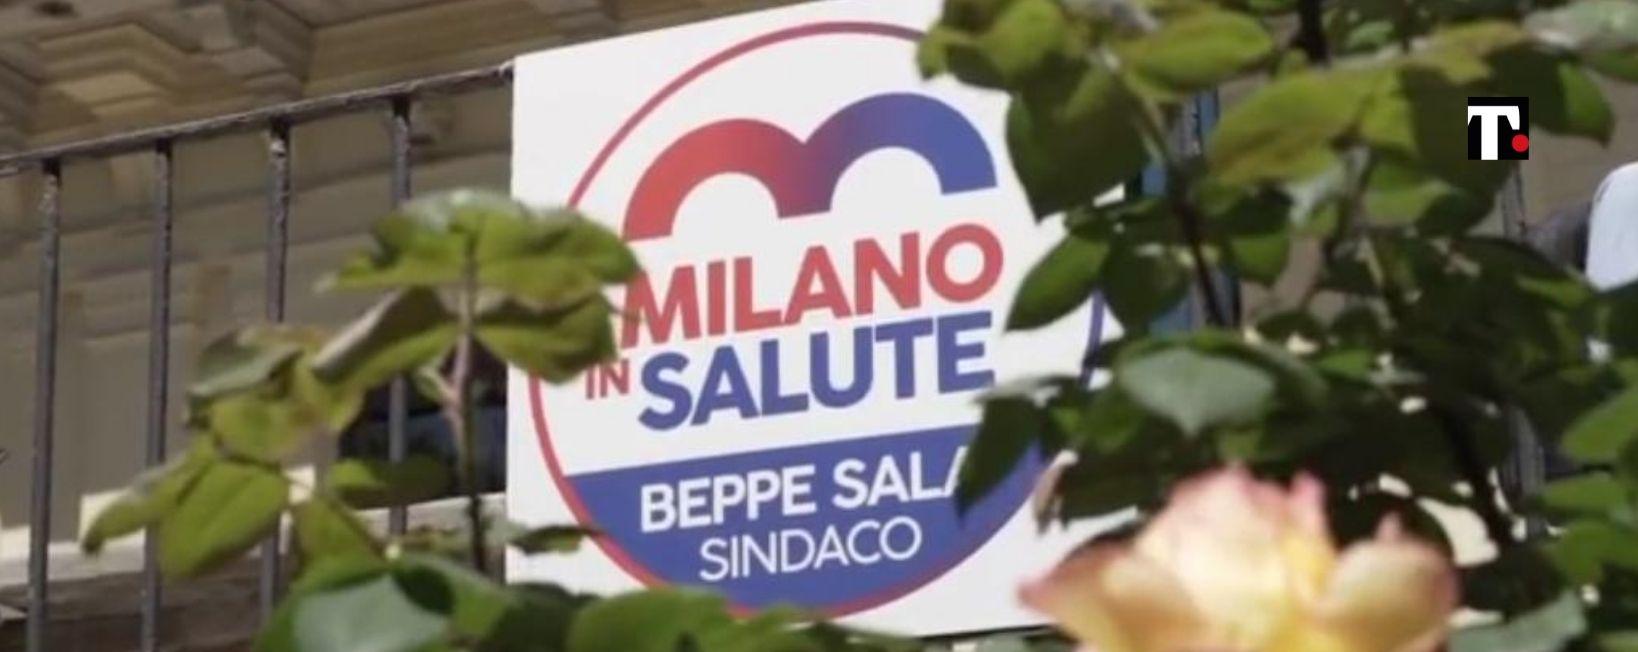 Milano in Salute, nuova lista Beppe Sala sindaco